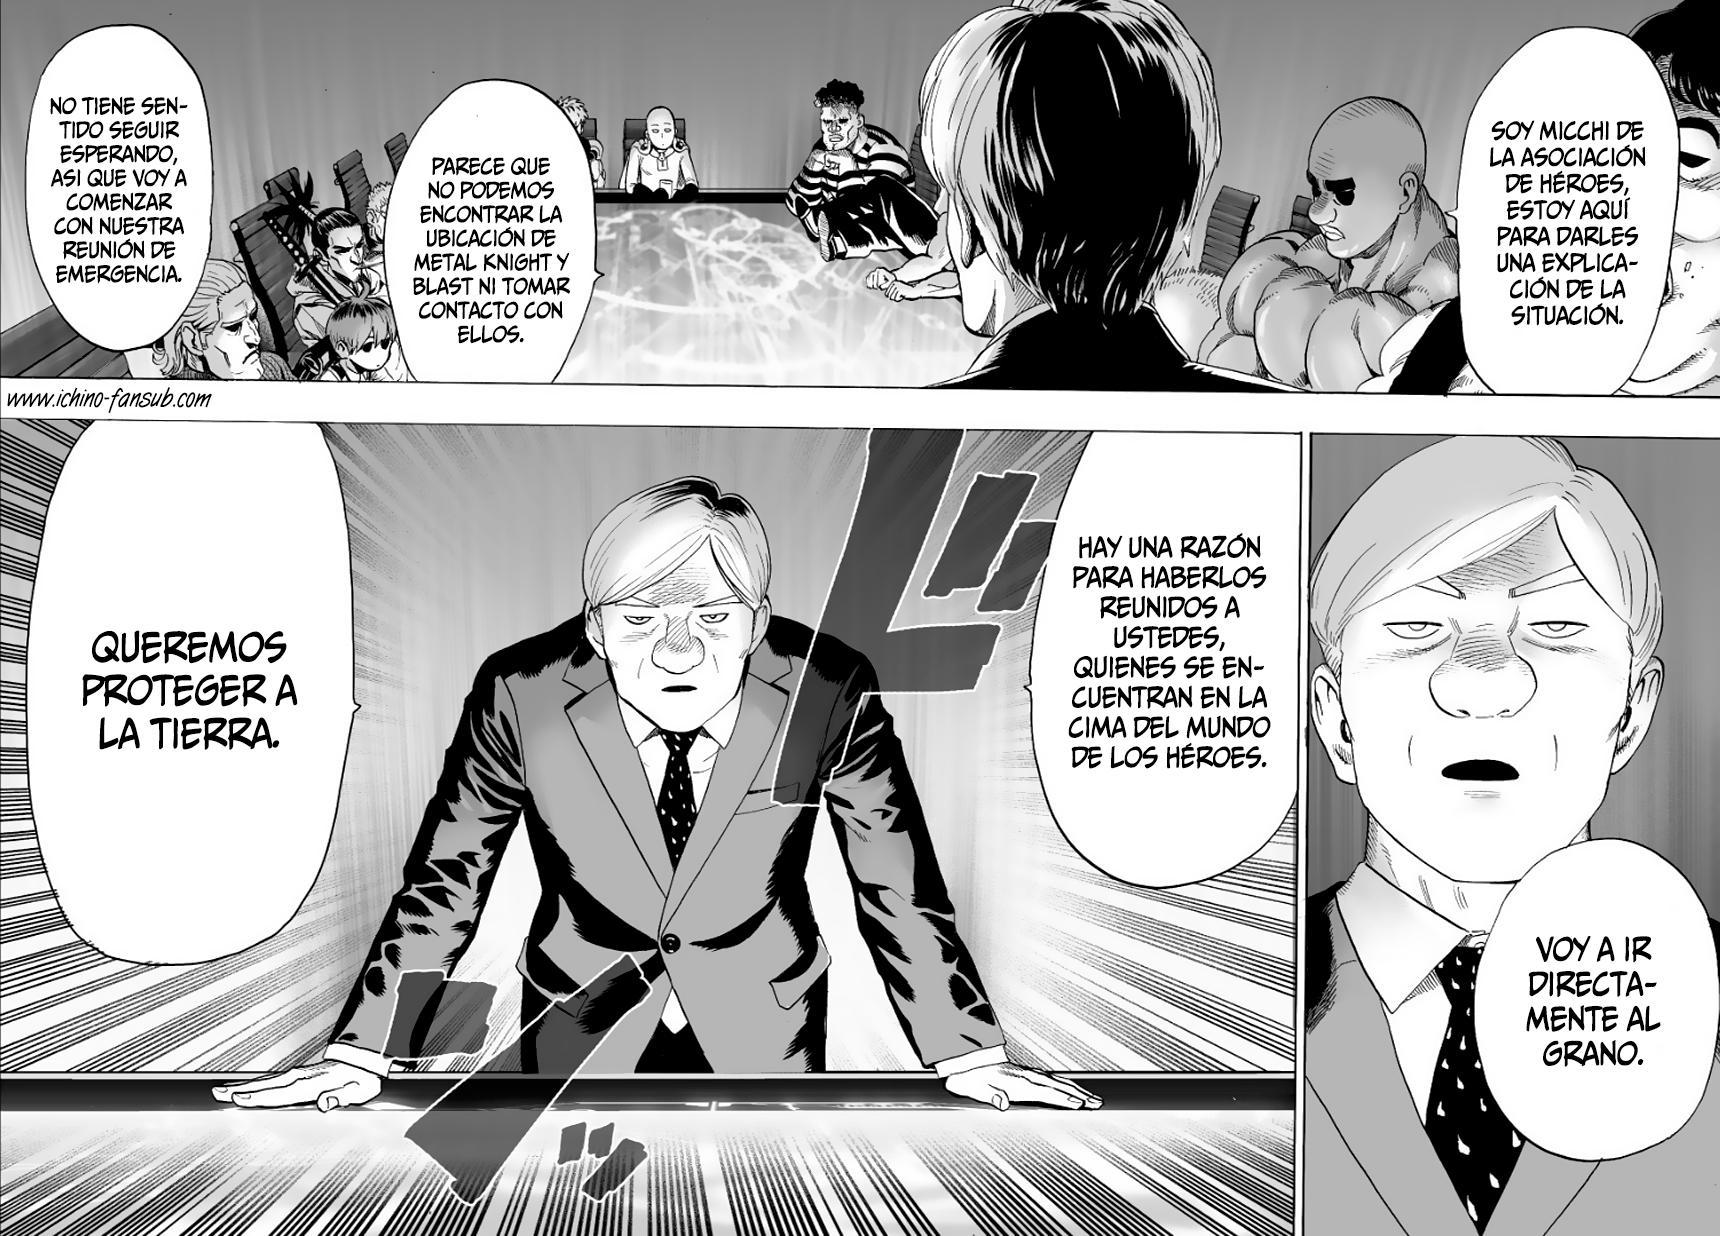 https://c5.ninemanga.com/es_manga/21/14805/362308/ba32ac4781099e7ffe65f42e3cdf3d34.jpg Page 5